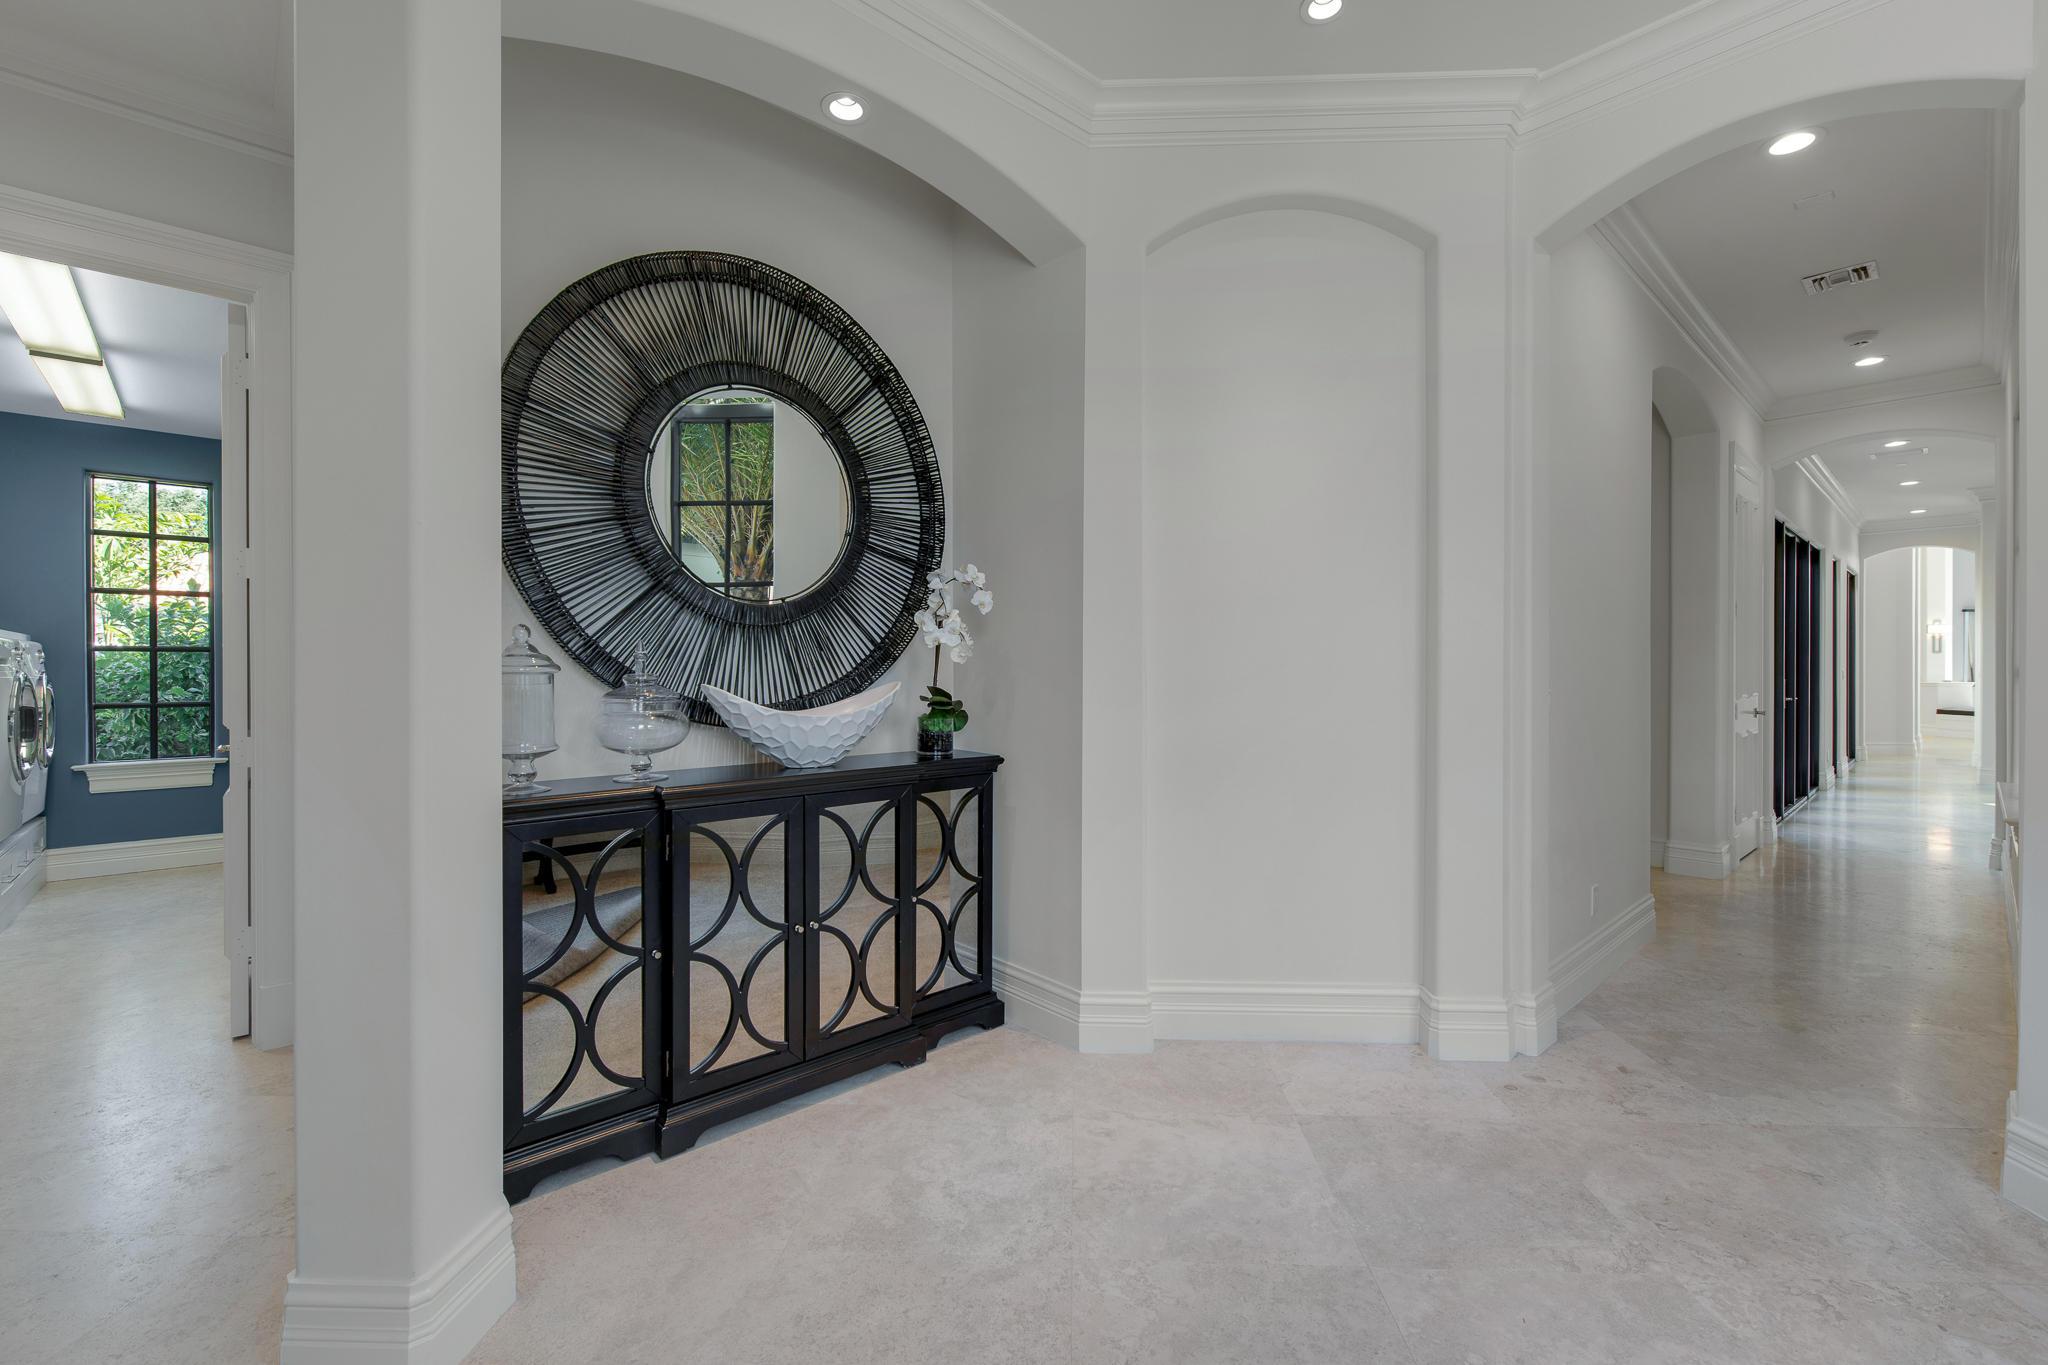 371 Regatta Drive, Jupiter, Florida 33477, 5 Bedrooms Bedrooms, ,5.1 BathroomsBathrooms,A,Single family,Regatta,RX-10504435